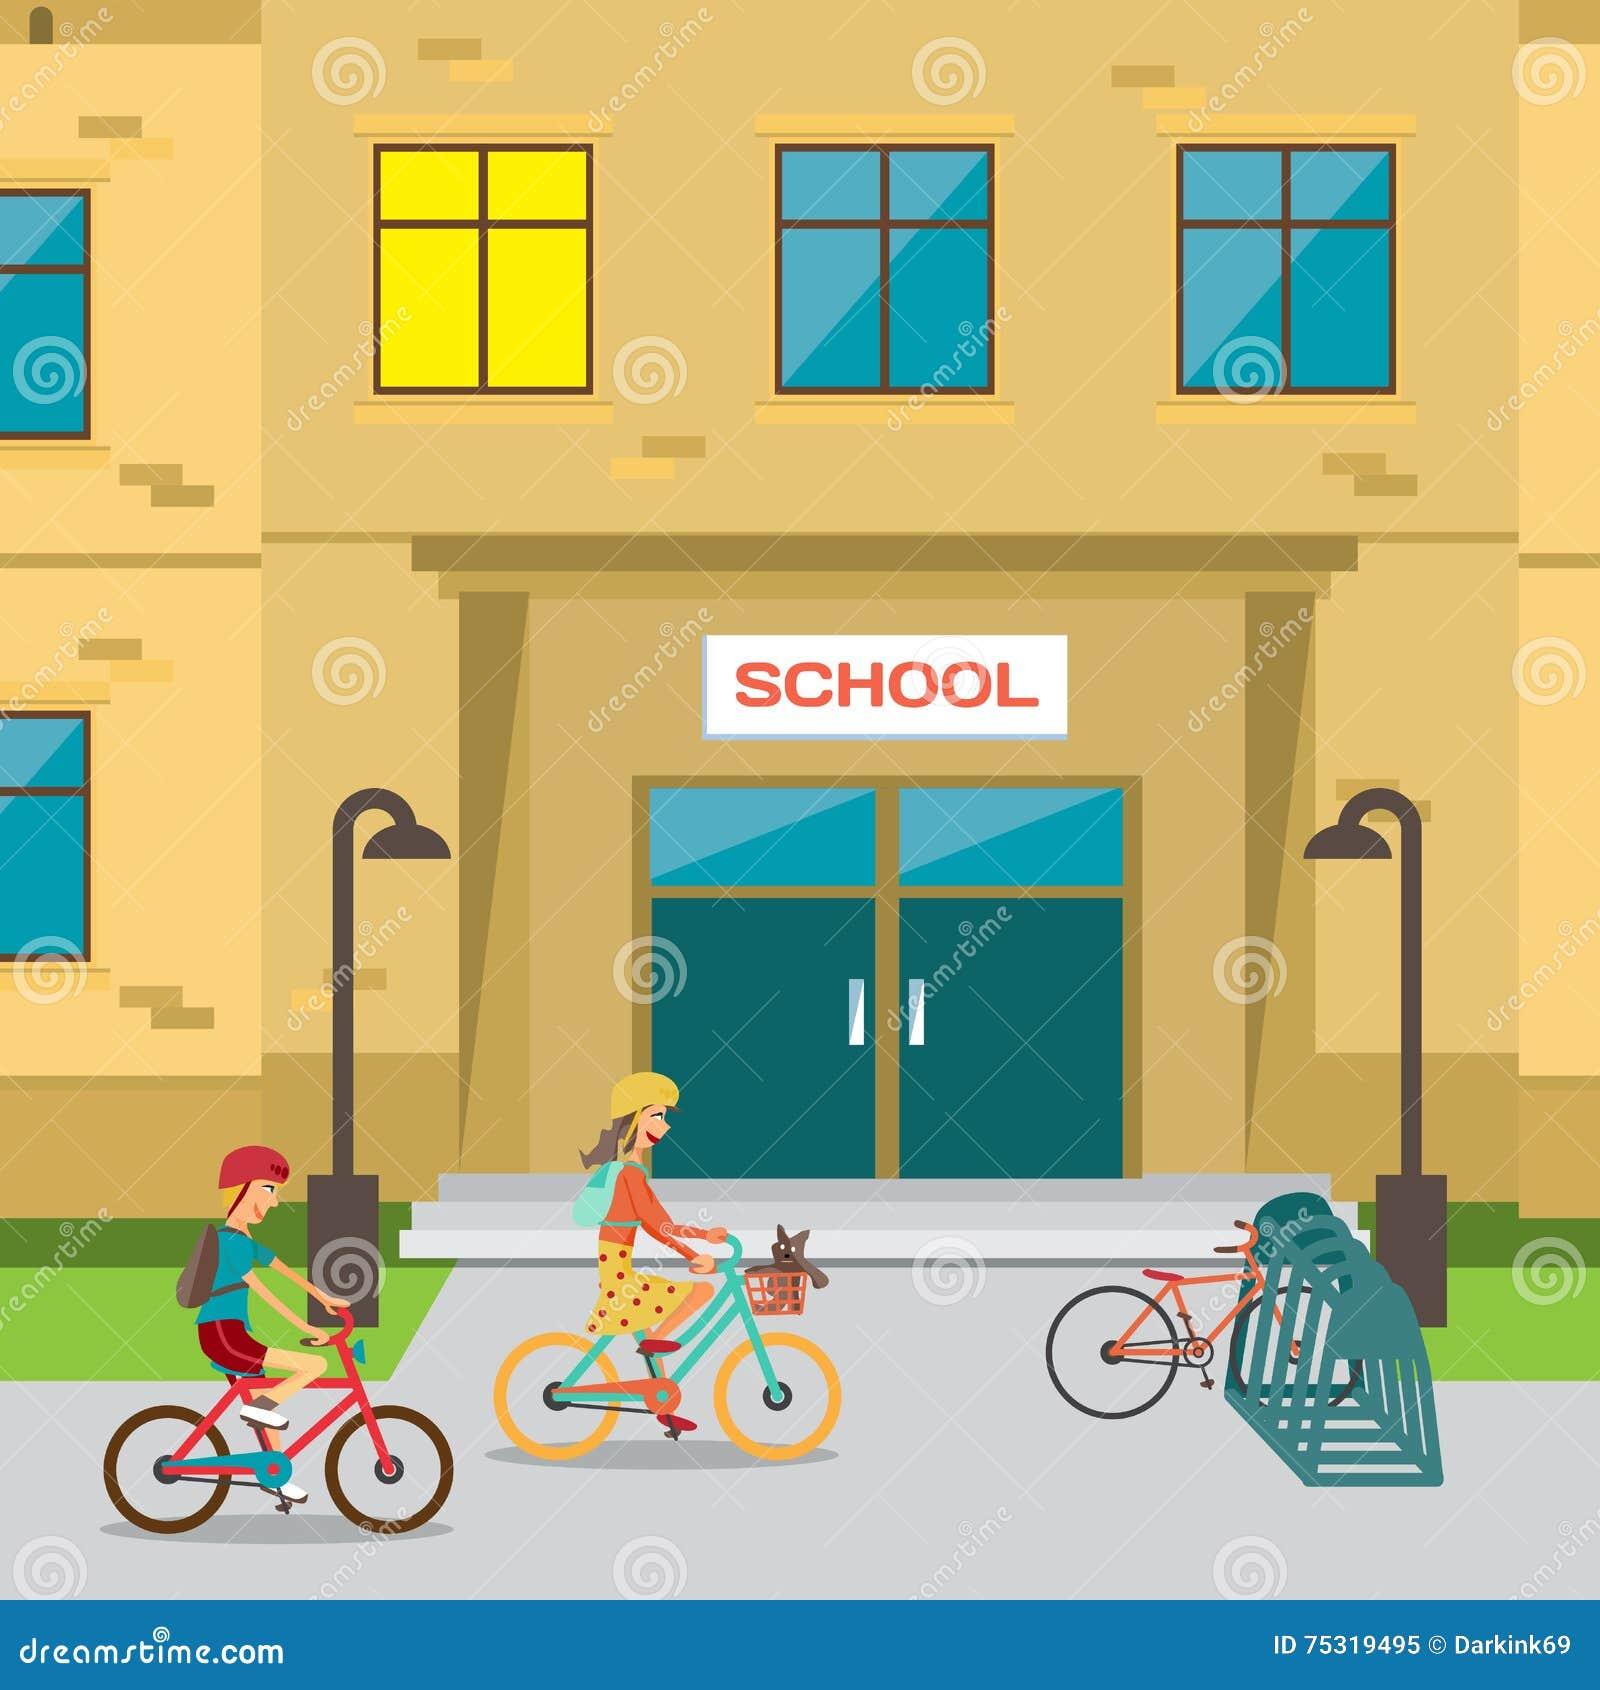 Children S Bicycle Parking Near The School Stock Vector